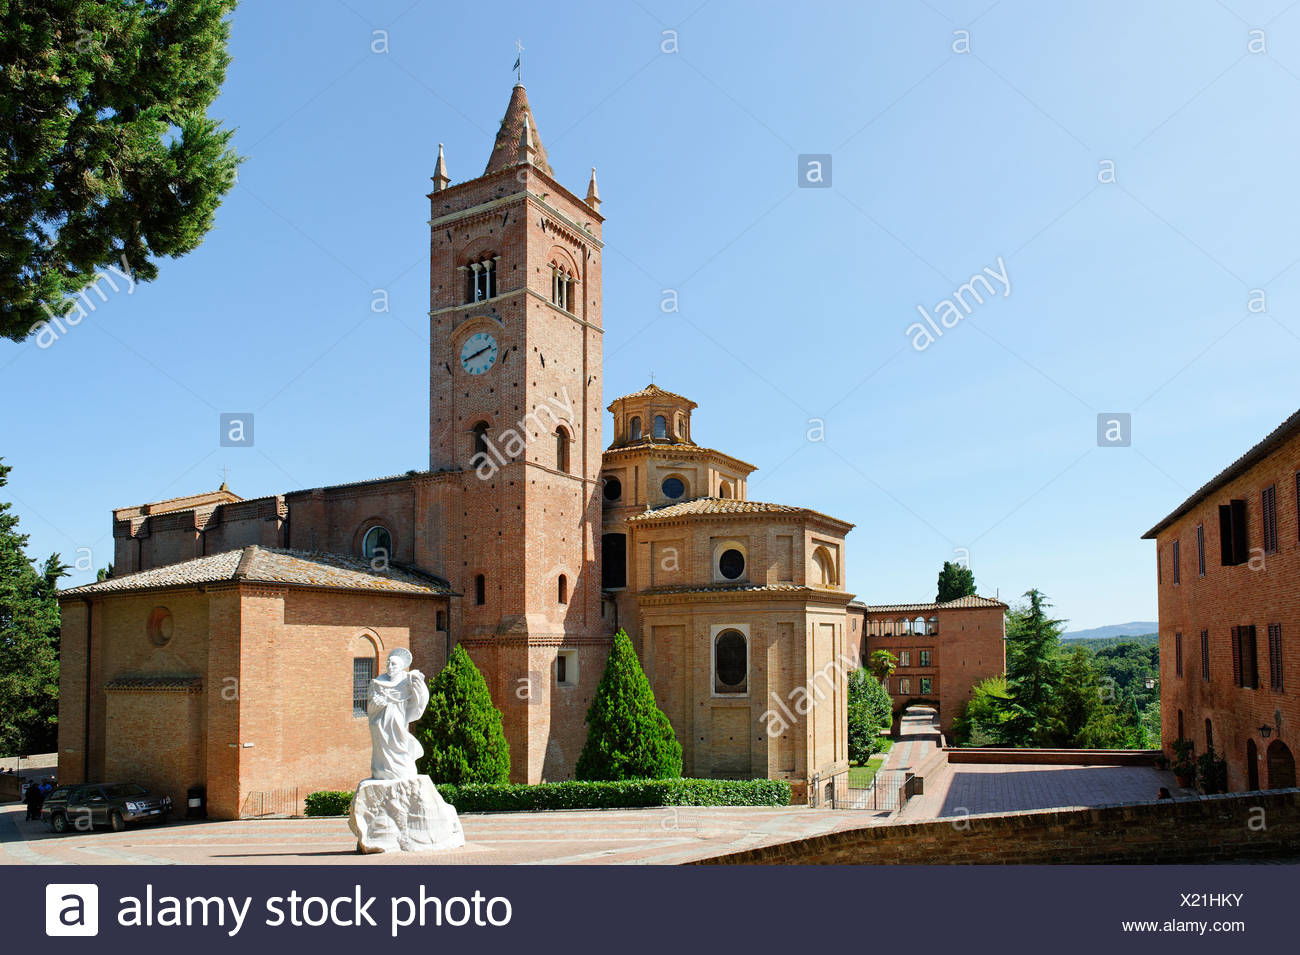 Benedictine monastery, territorial abbey of Monte Oliveto Maggiore, south of Siena, Crete Senesi, Tuscany, Italy, Europe - Stock Image